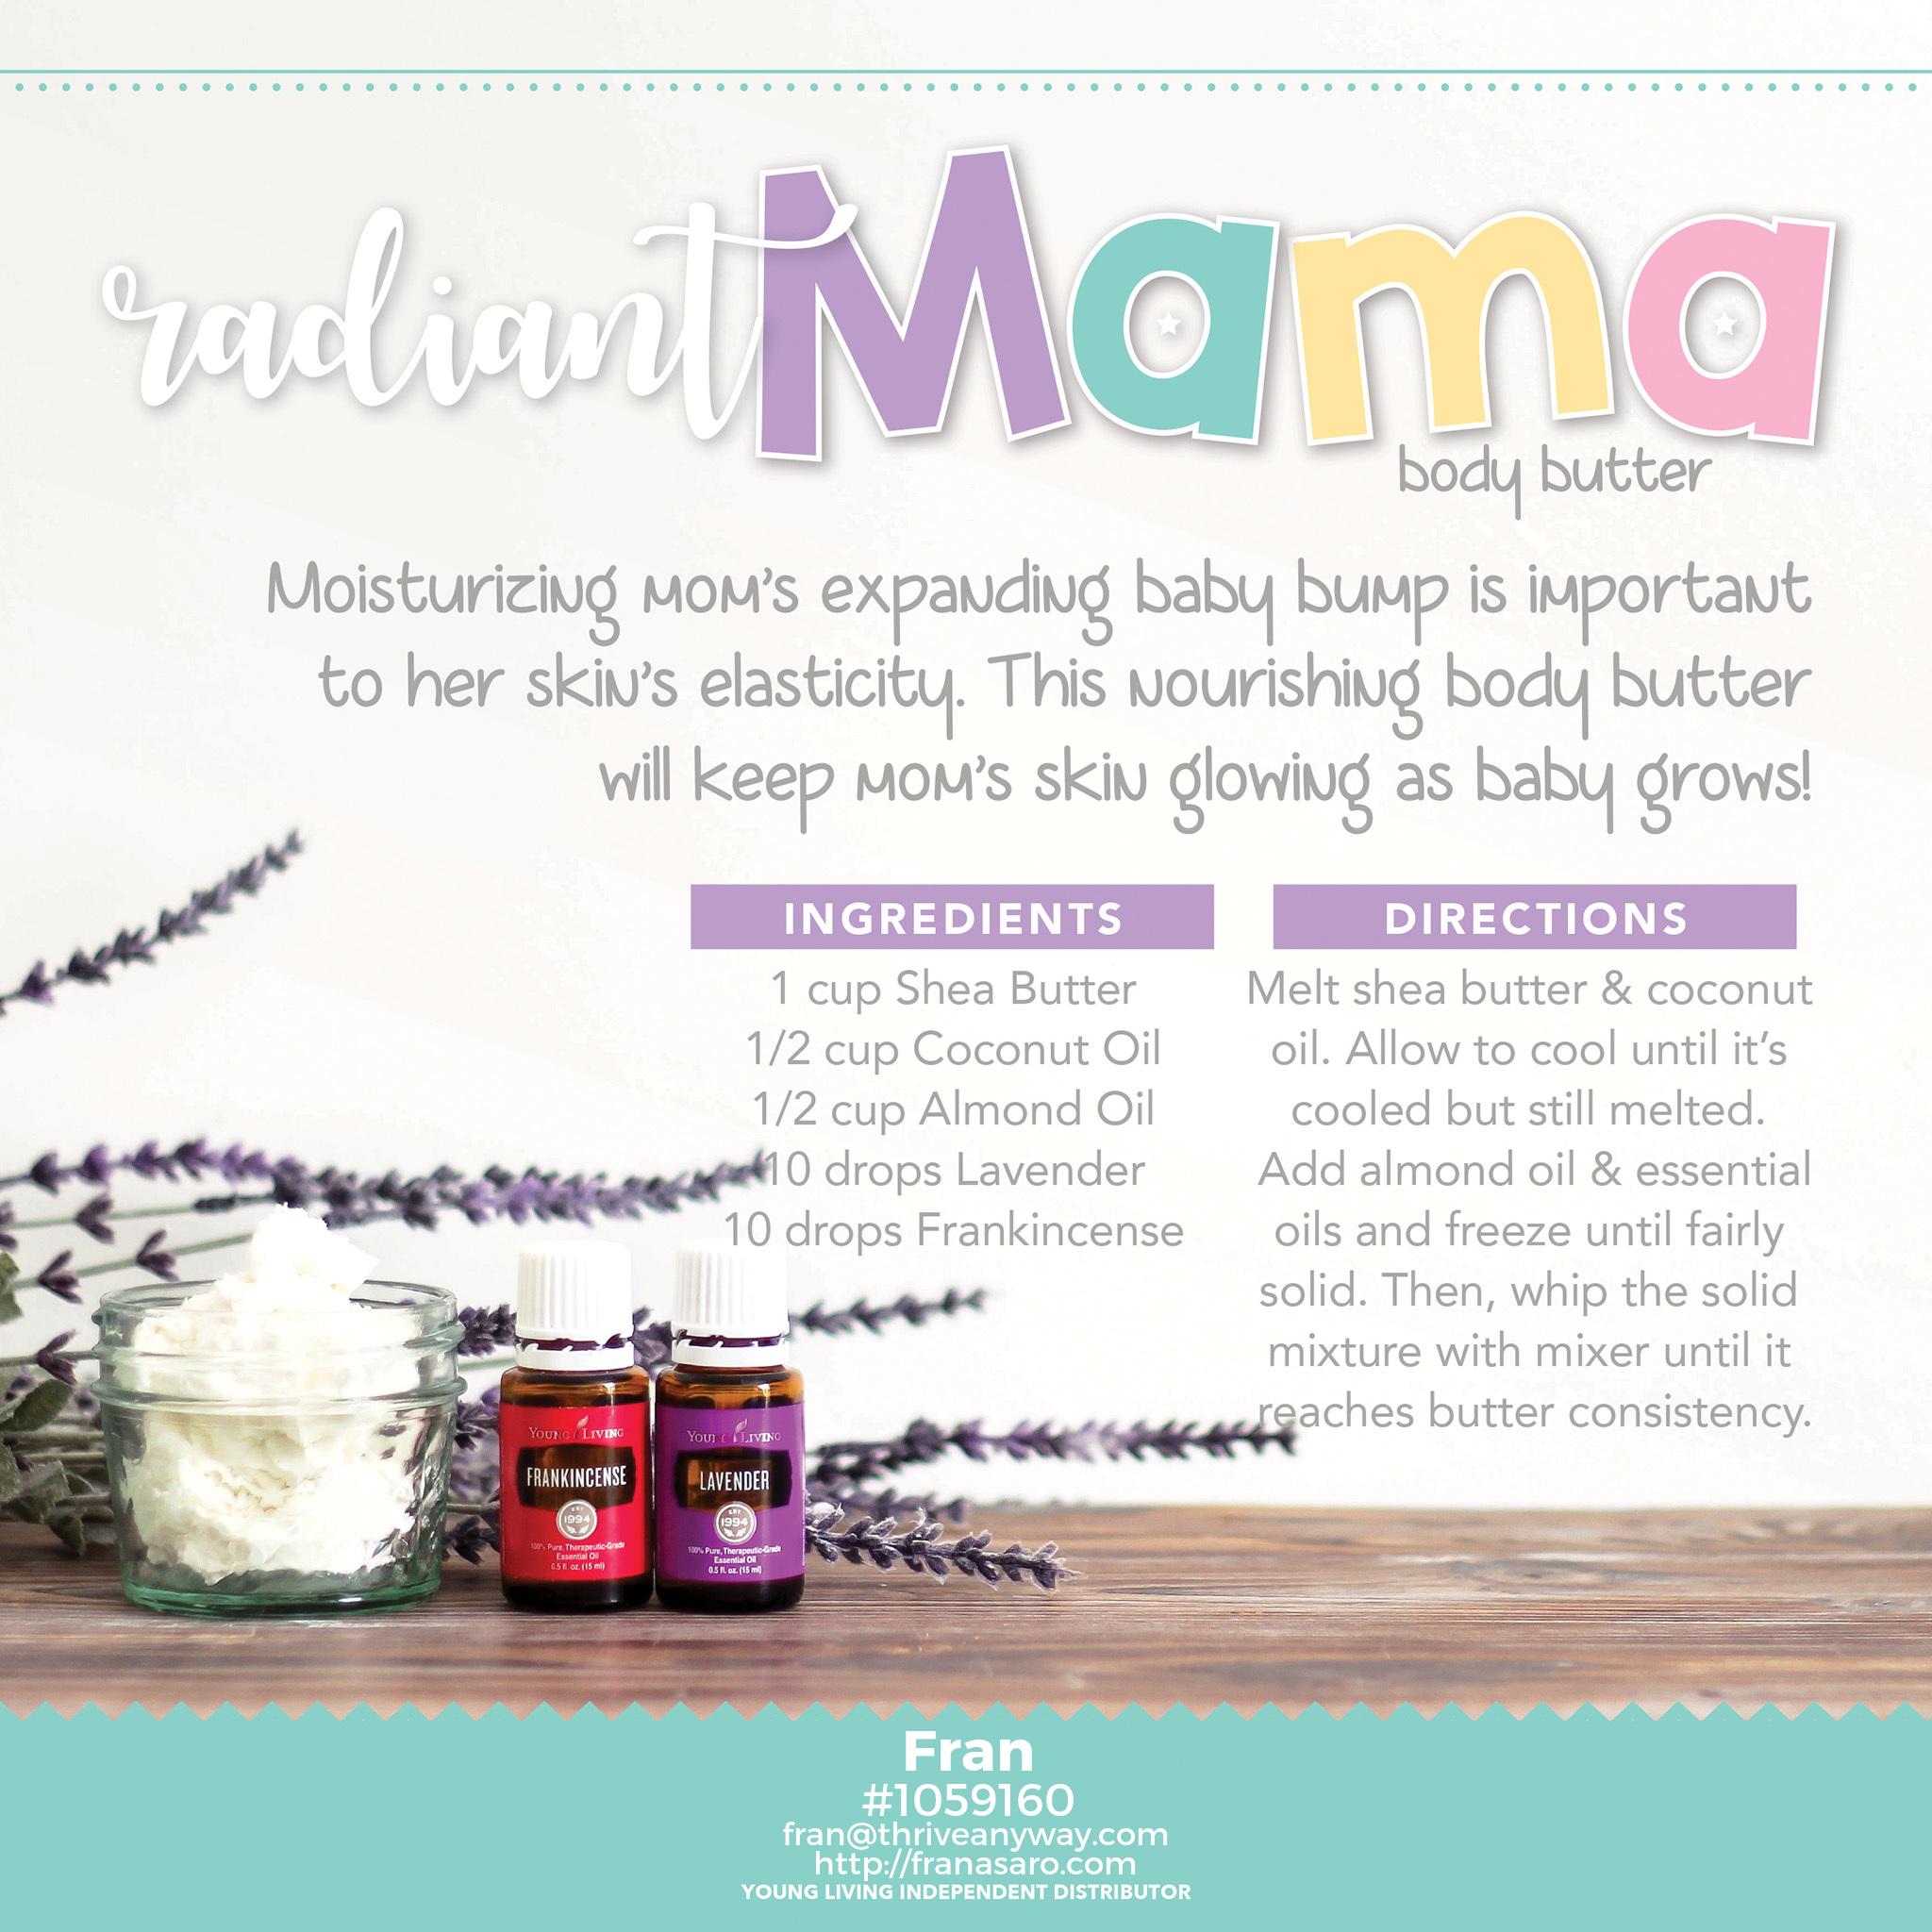 Radiant Mama